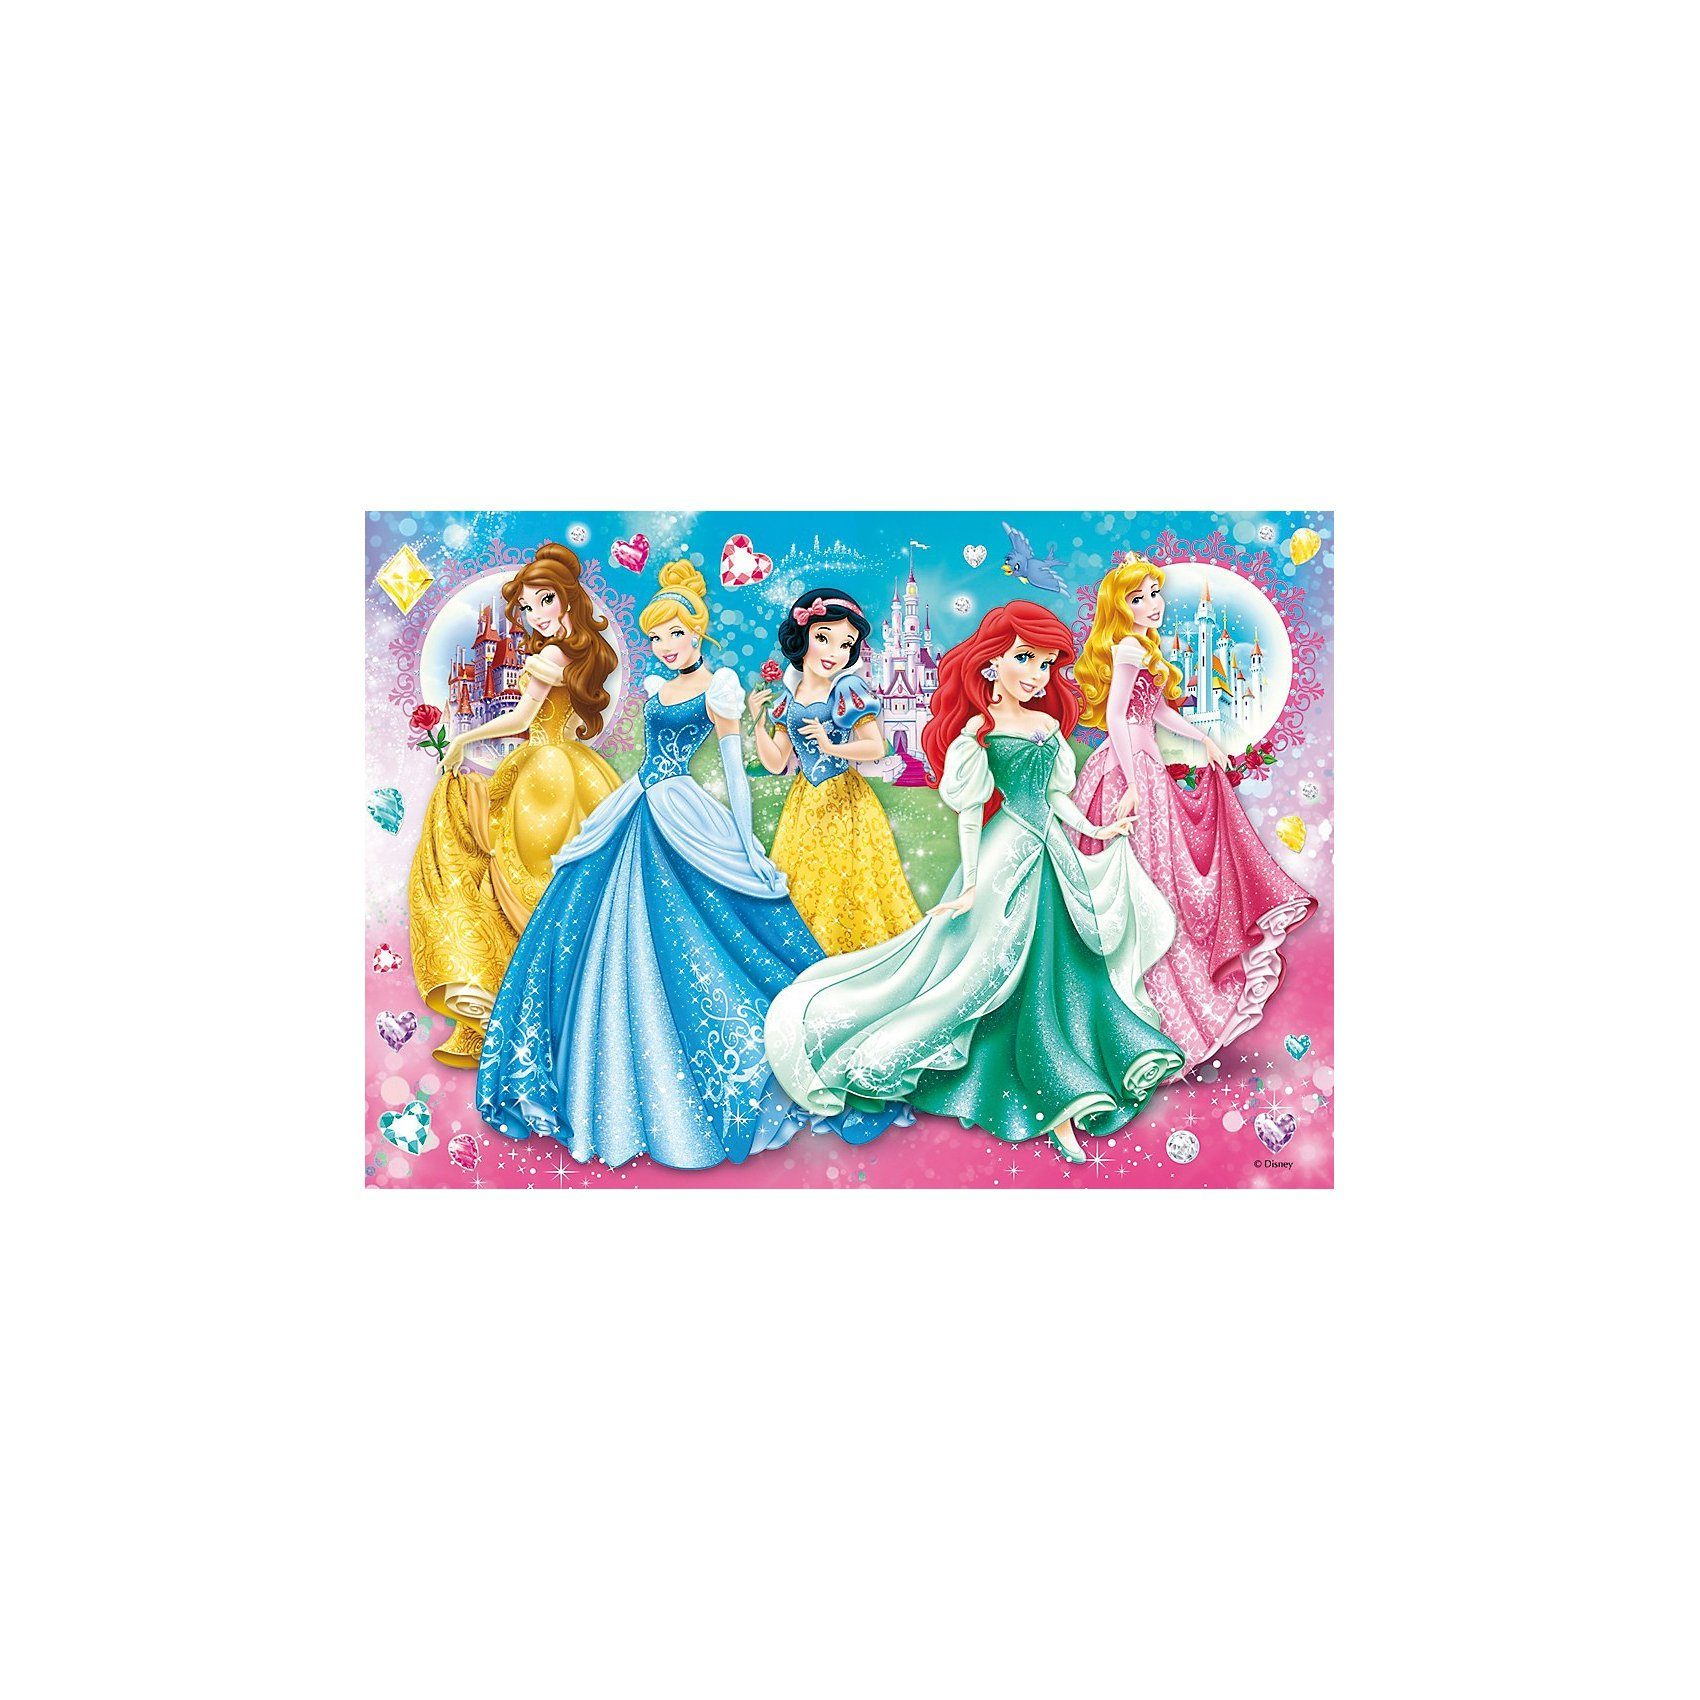 Clementoni® Puzzle mit Glitzersteinen - 104 Teile Princess: Twinkled Lad